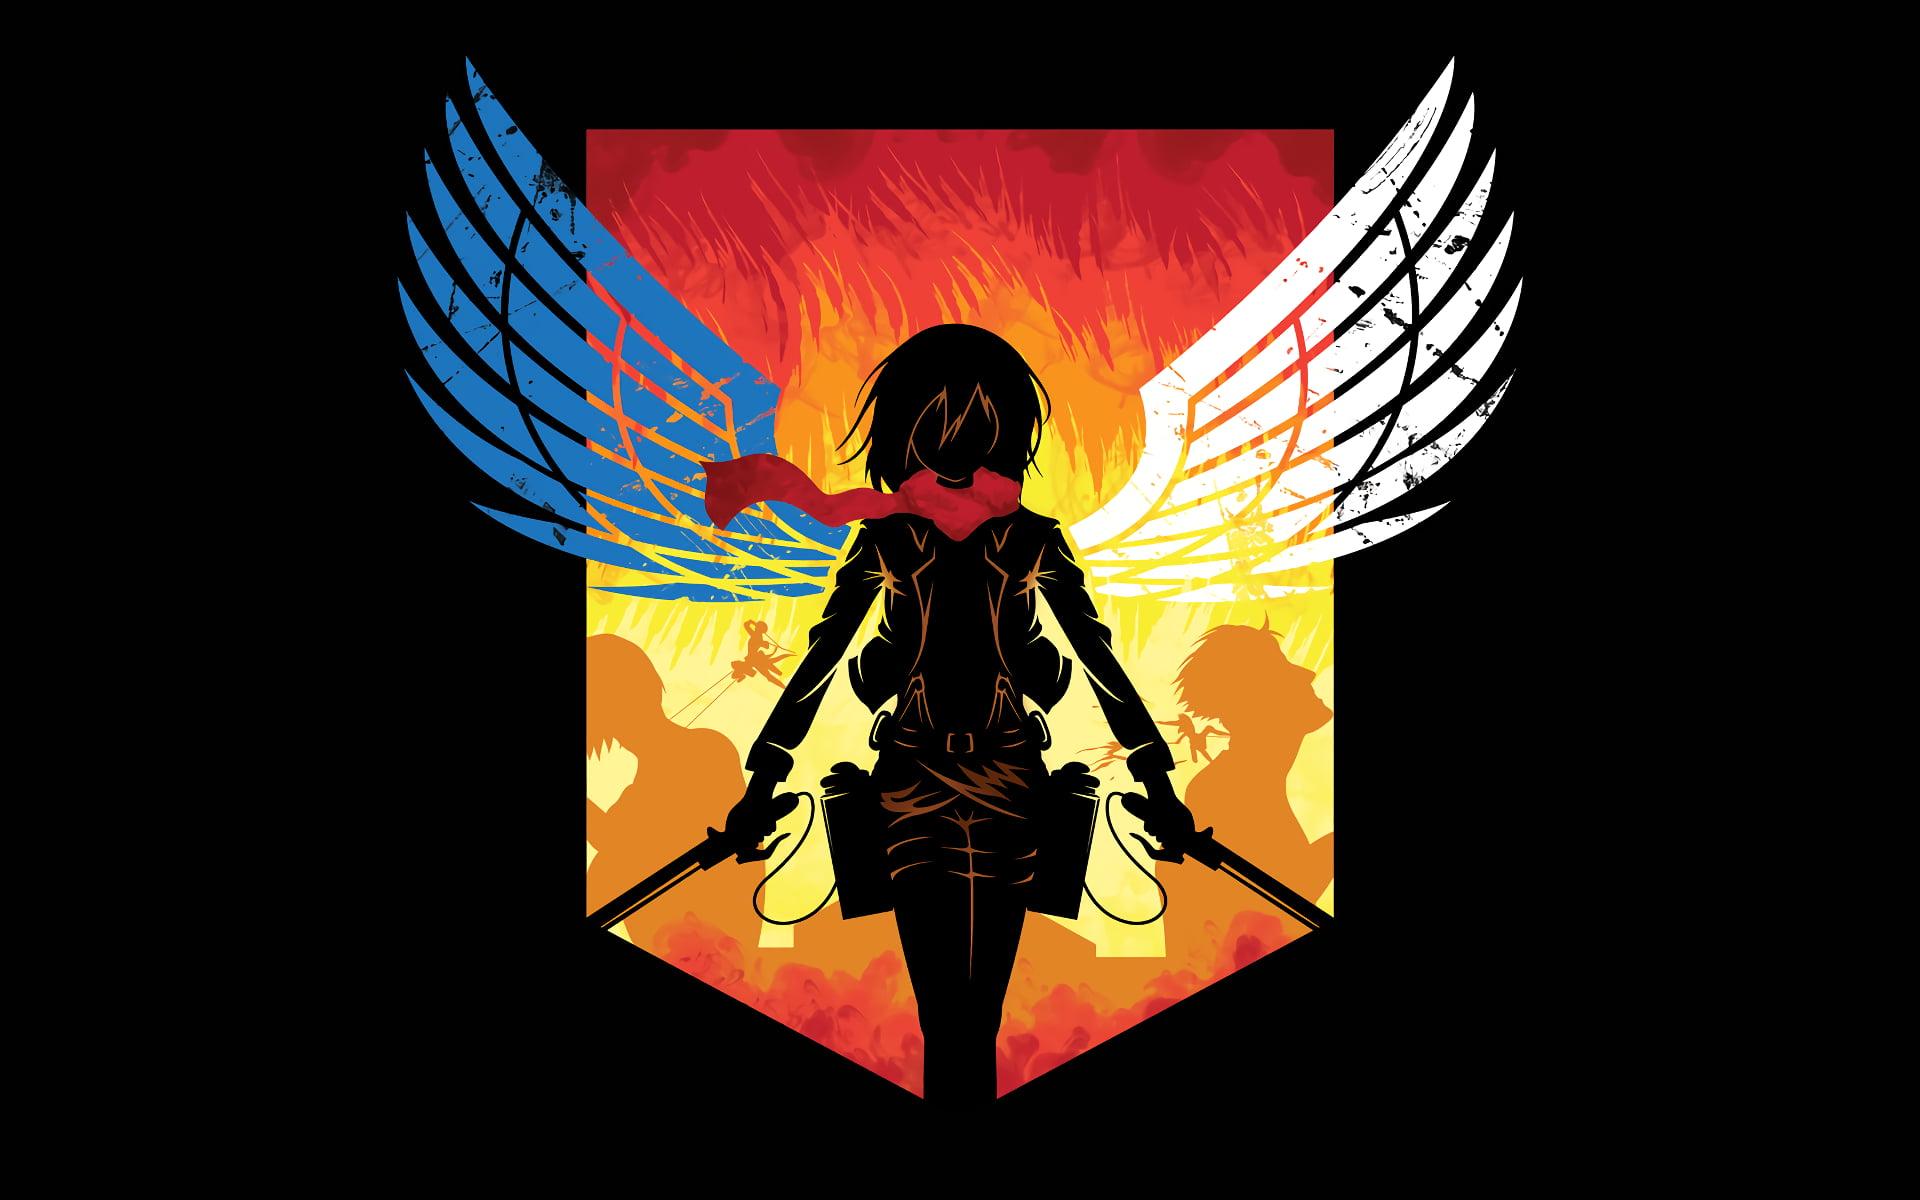 Hd Wallpaper Attack On Titan Logo - 1920x1200 - Download ...